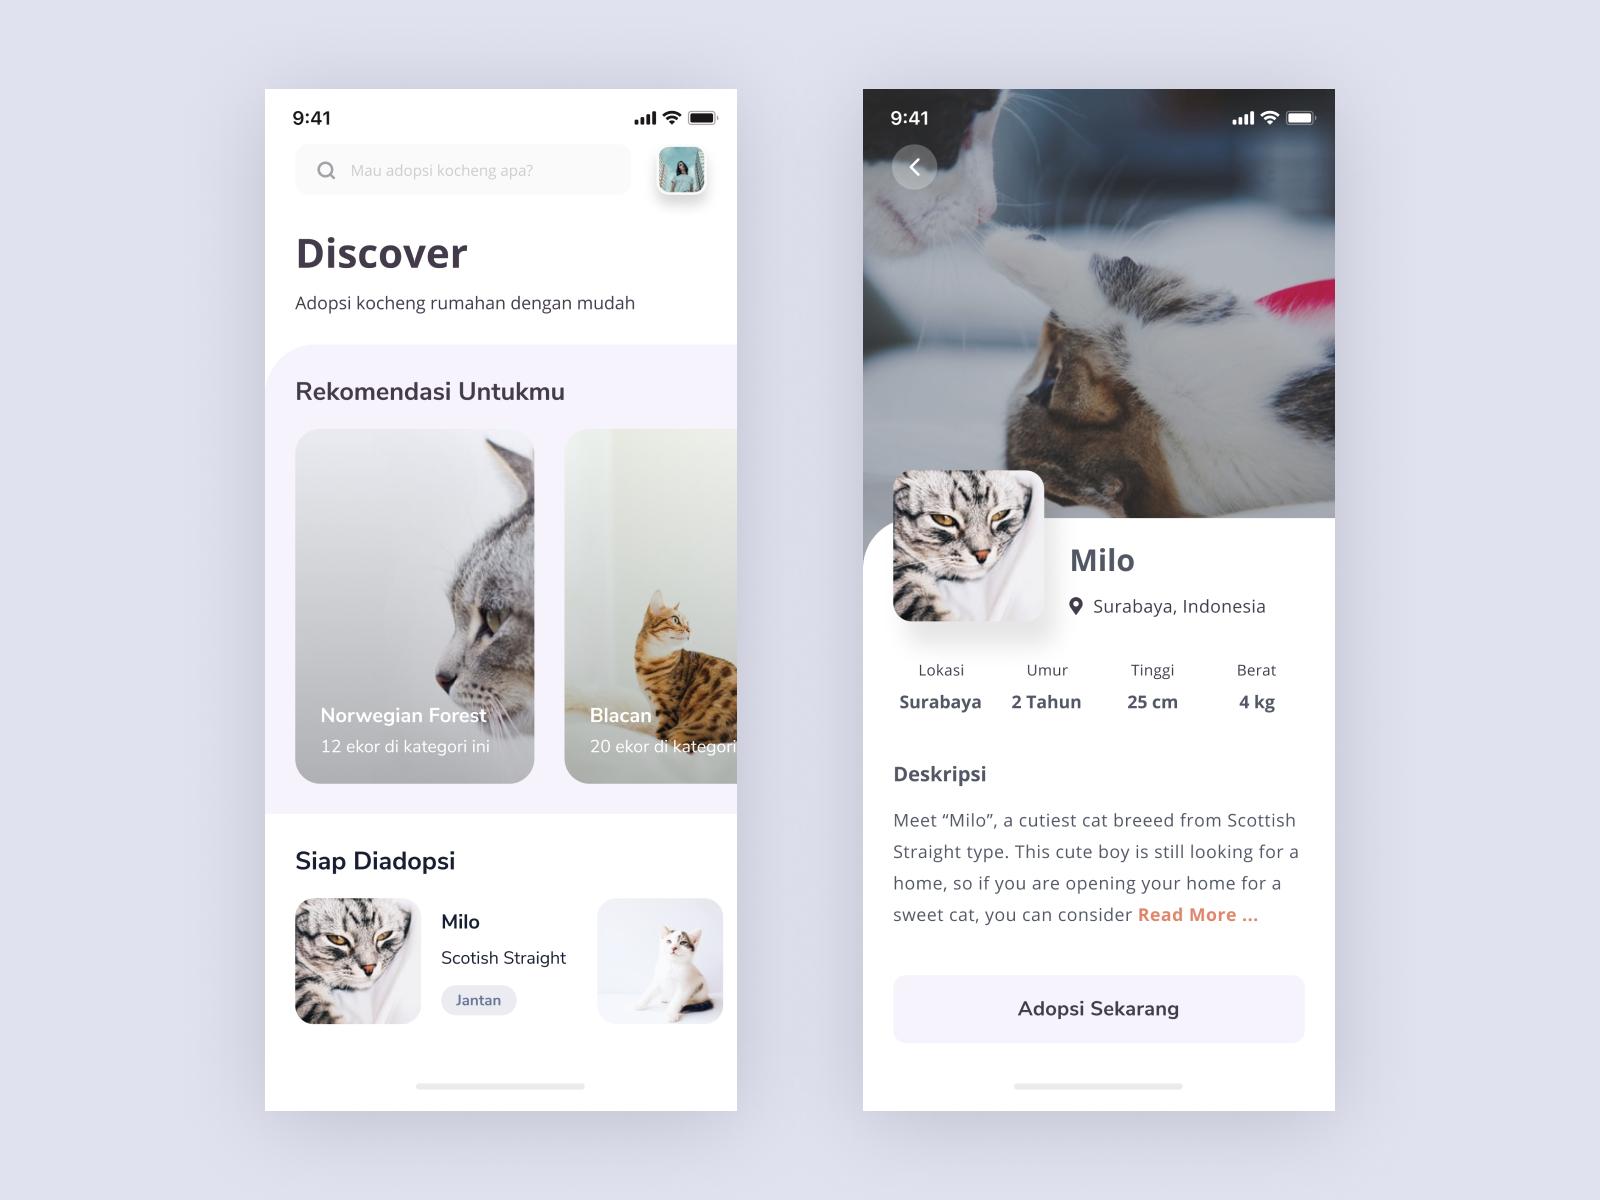 App Di Design kocheng adoption app - exploration design | search by muzli